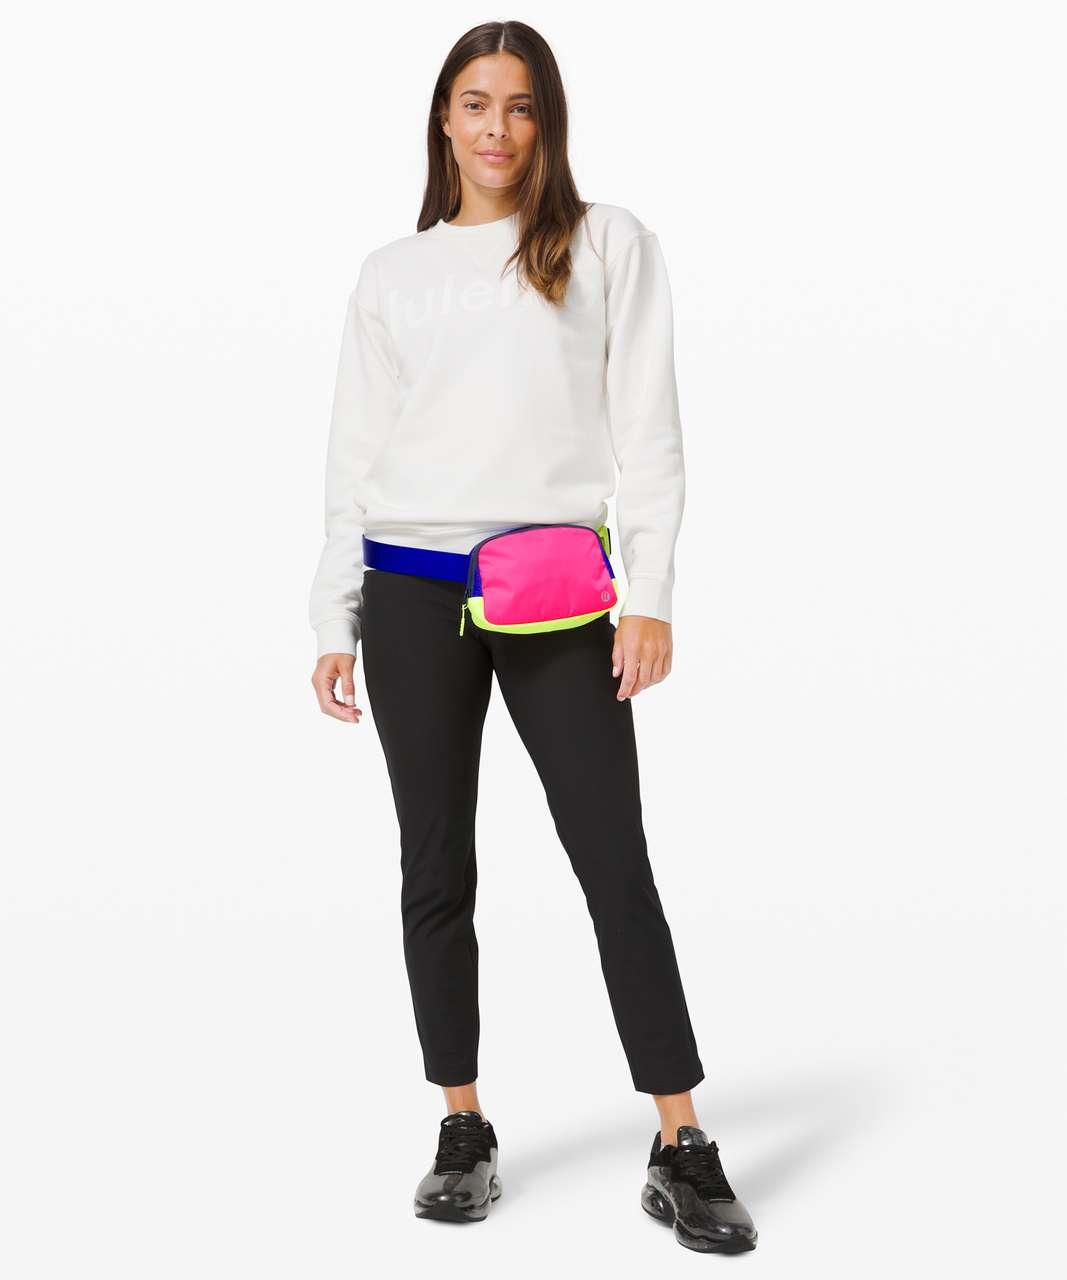 Lululemon Everywhere Belt Bag *1L - Pink Highlight / Cerulean Blue / Highlight Yellow